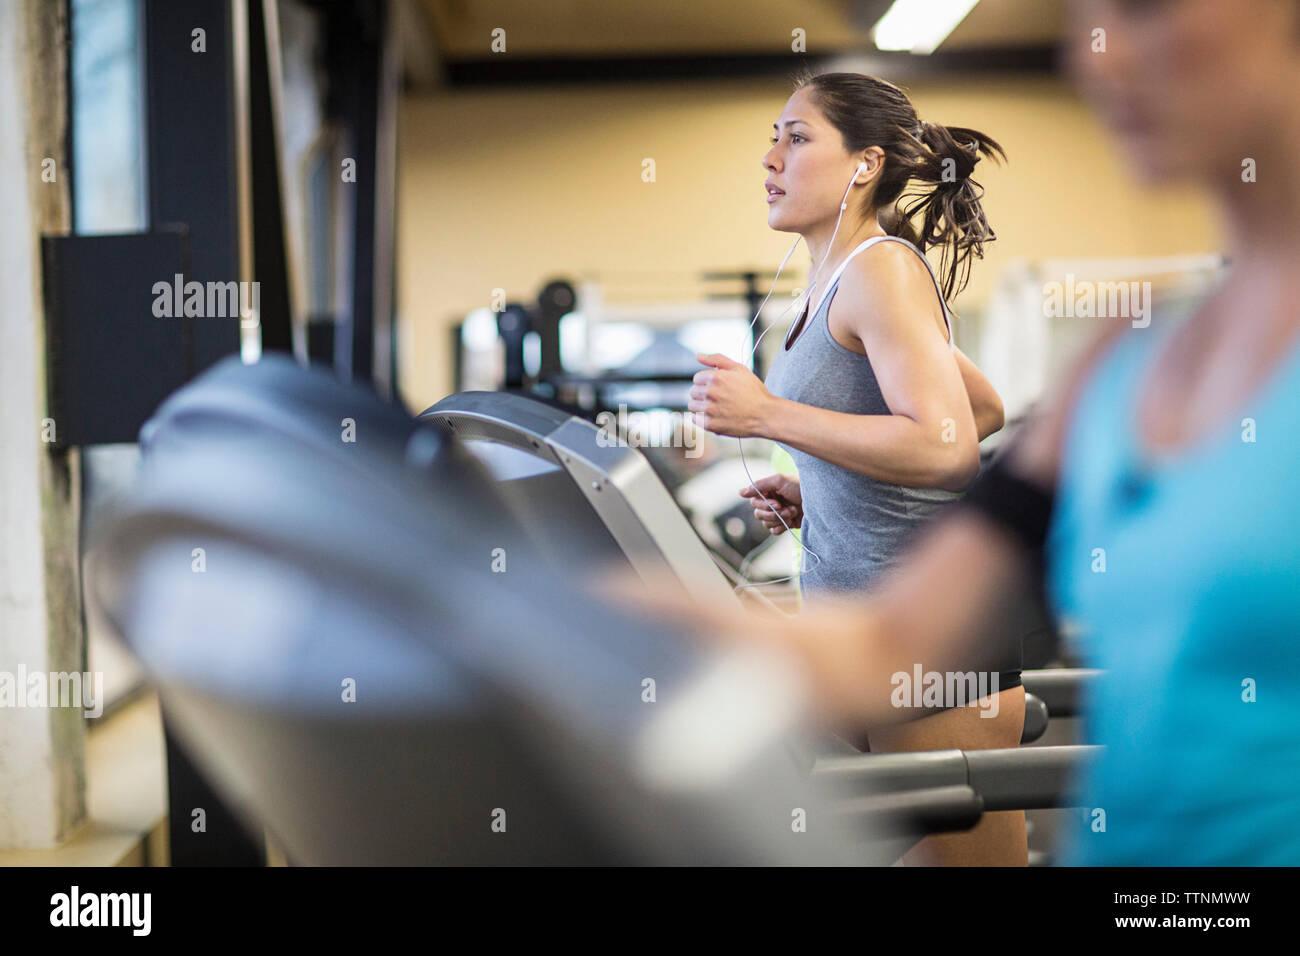 Women exercising on treadmills in health club - Stock Image